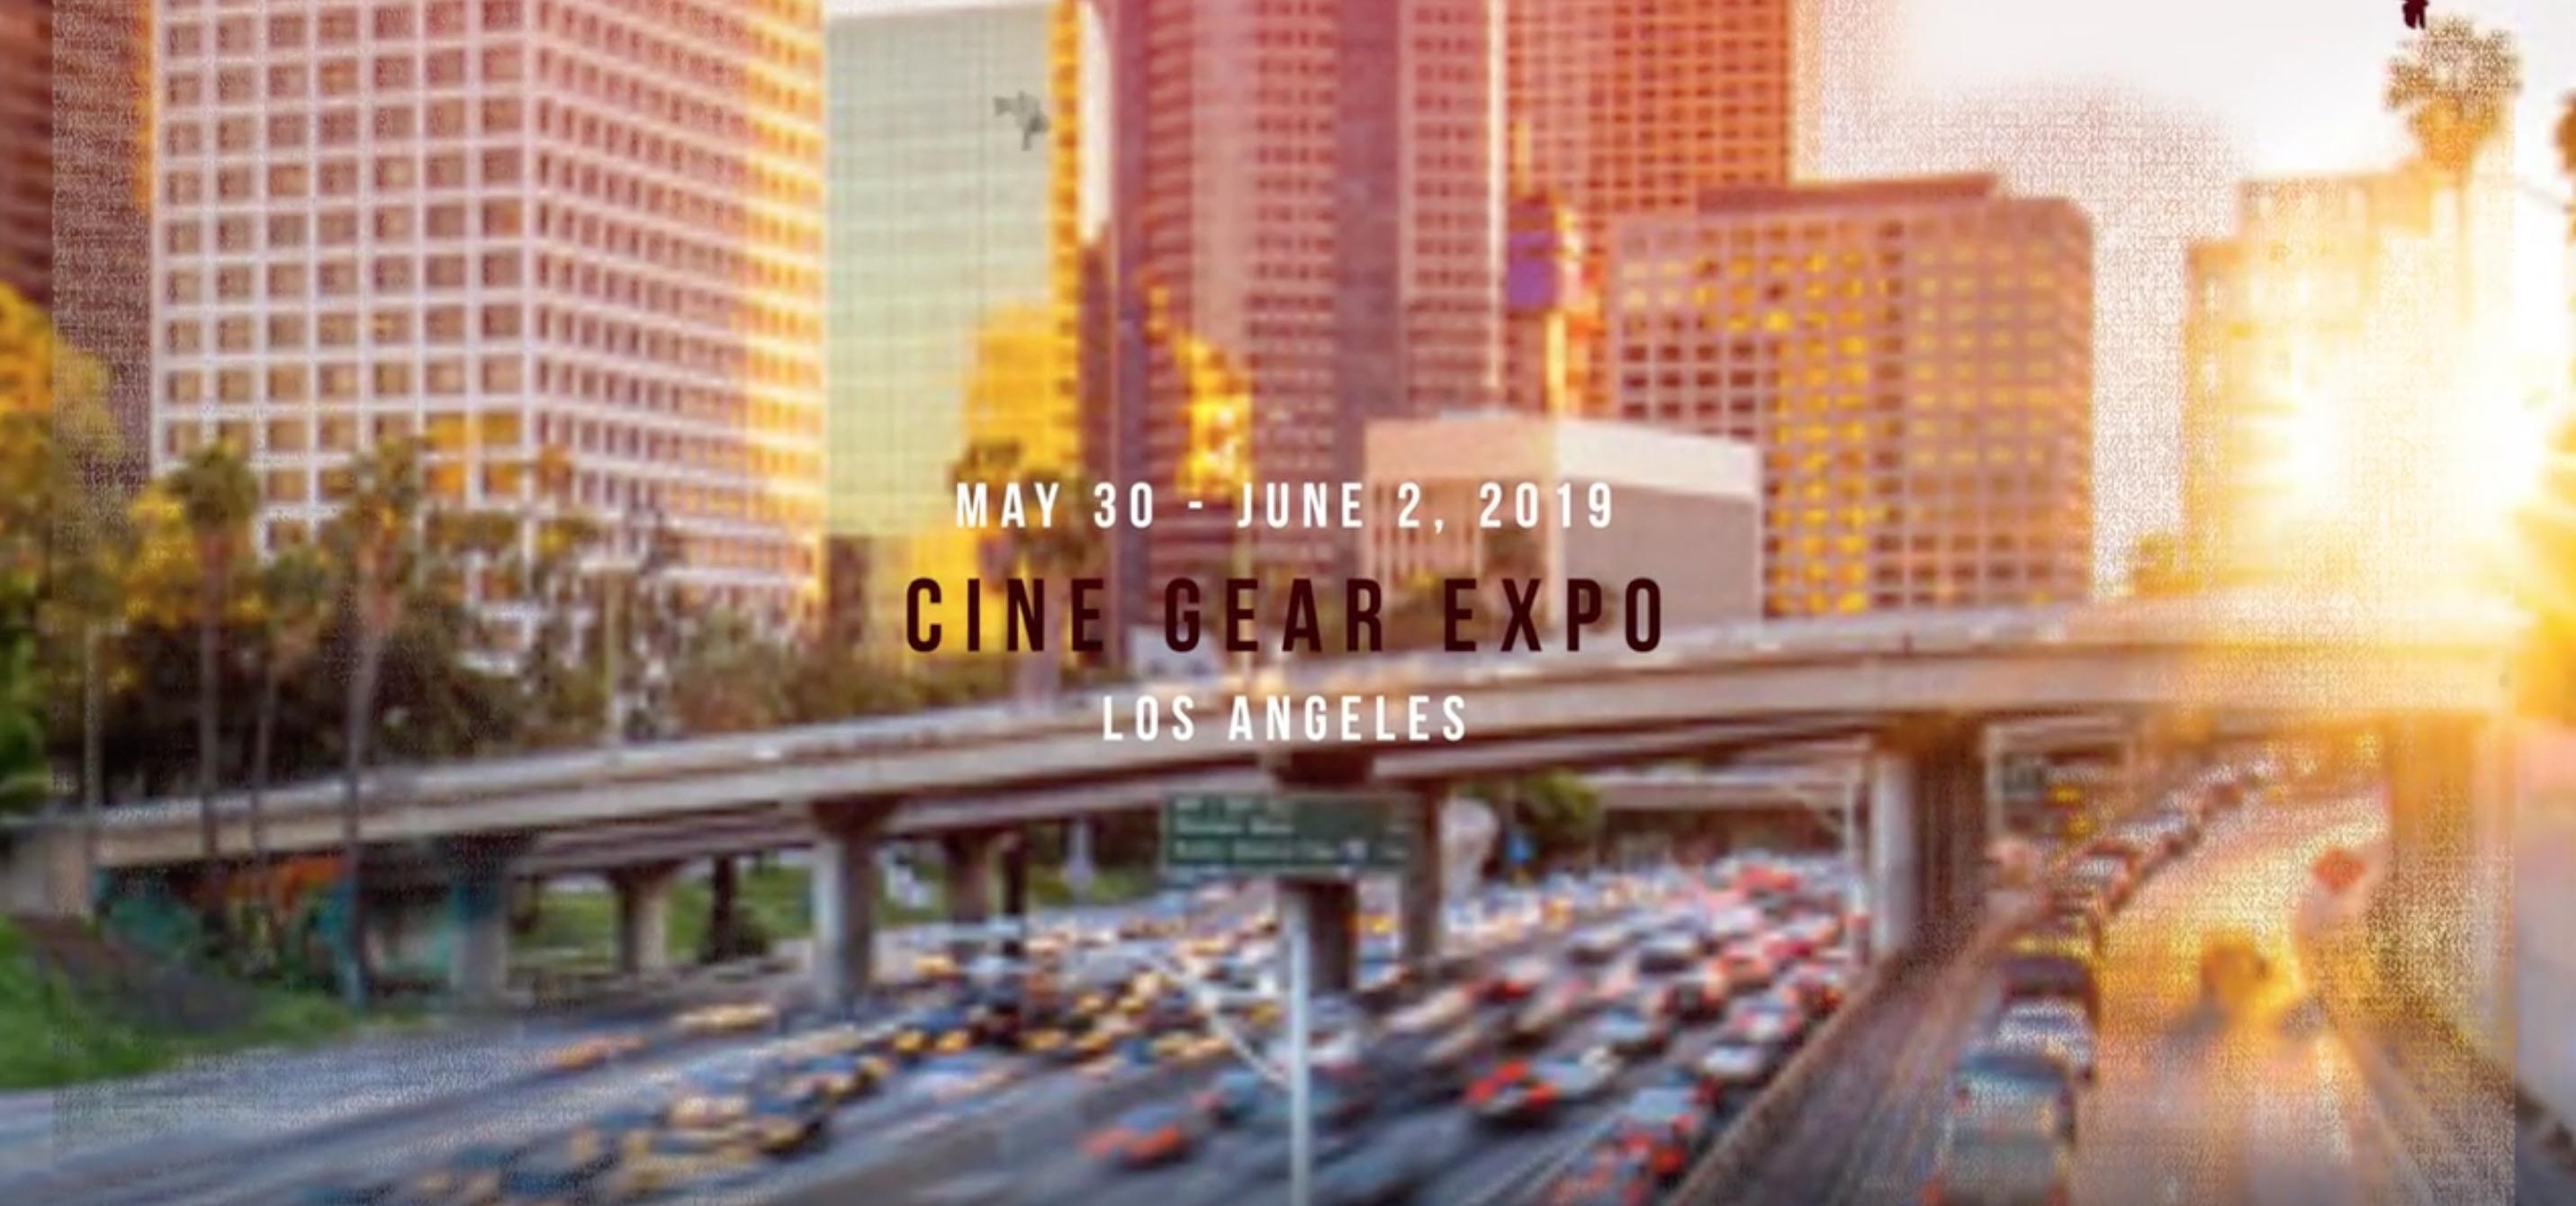 bebob auf der Cine Gear in Los Angeles